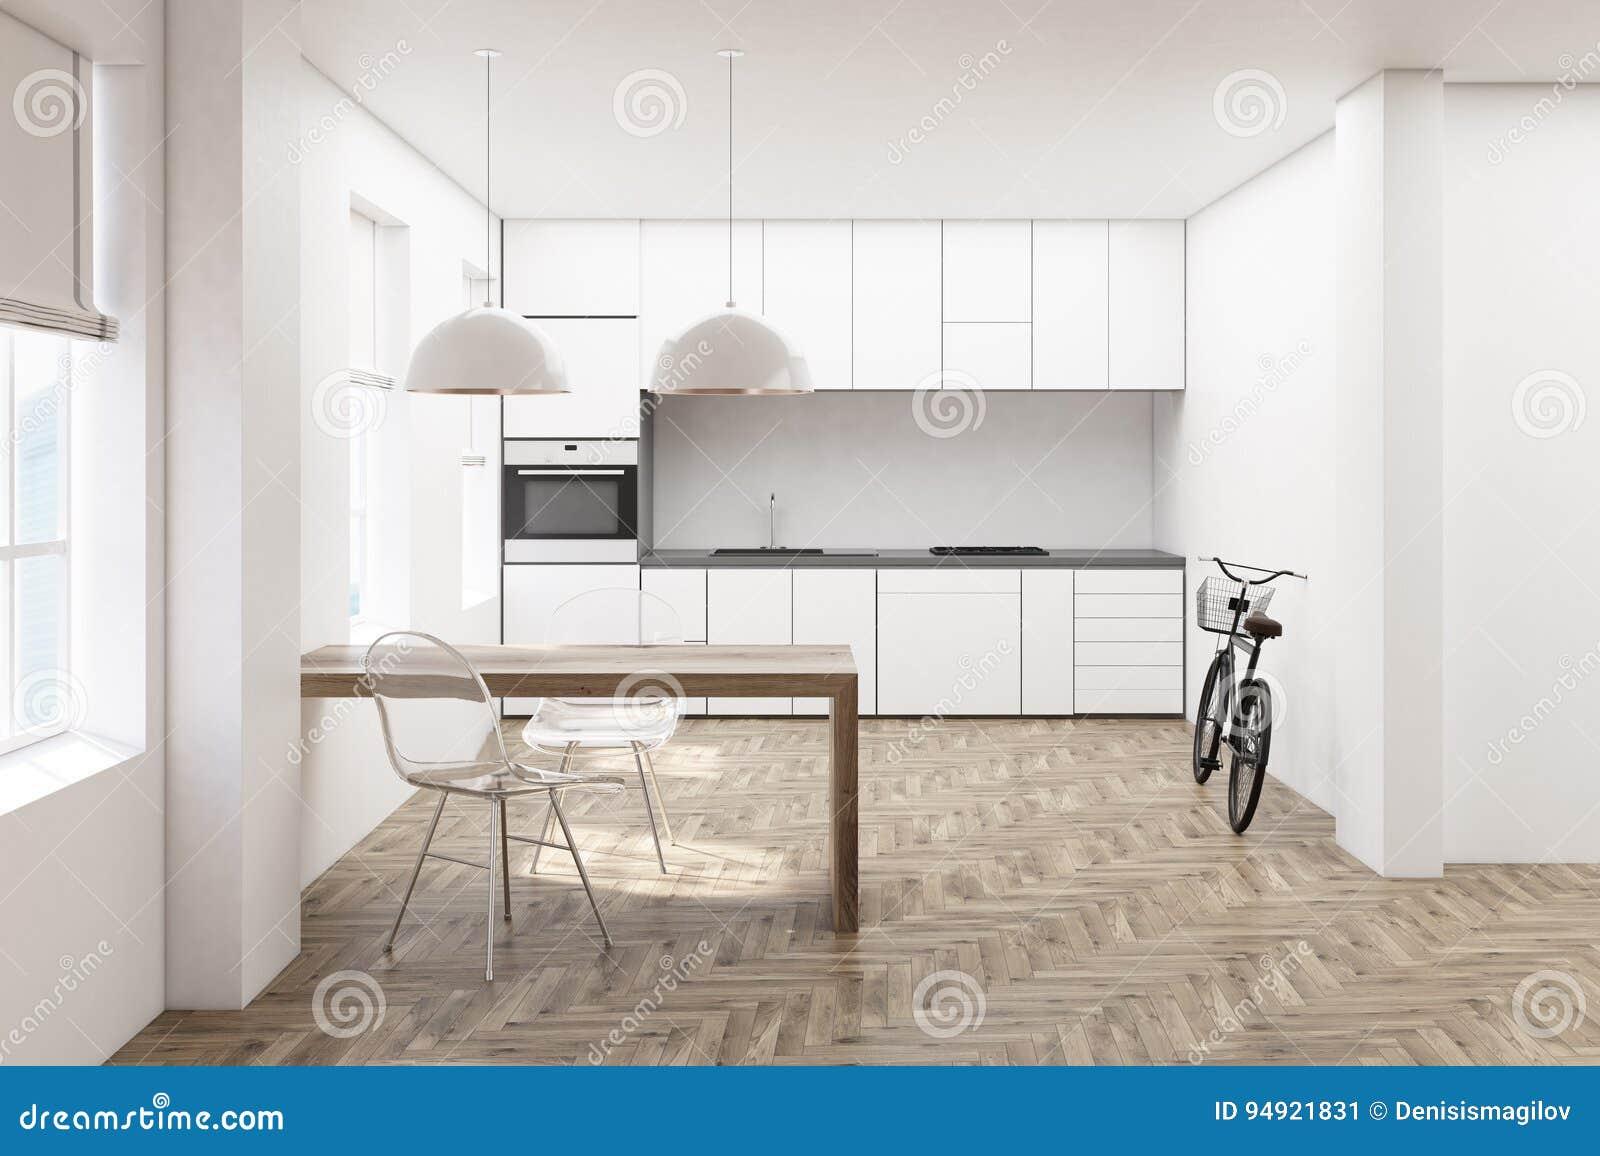 Pavimento cucina bianca awesome cucina bianca opaca vip design amazing pavimento cucina bianca - Piastrelle per cucina bianca ...